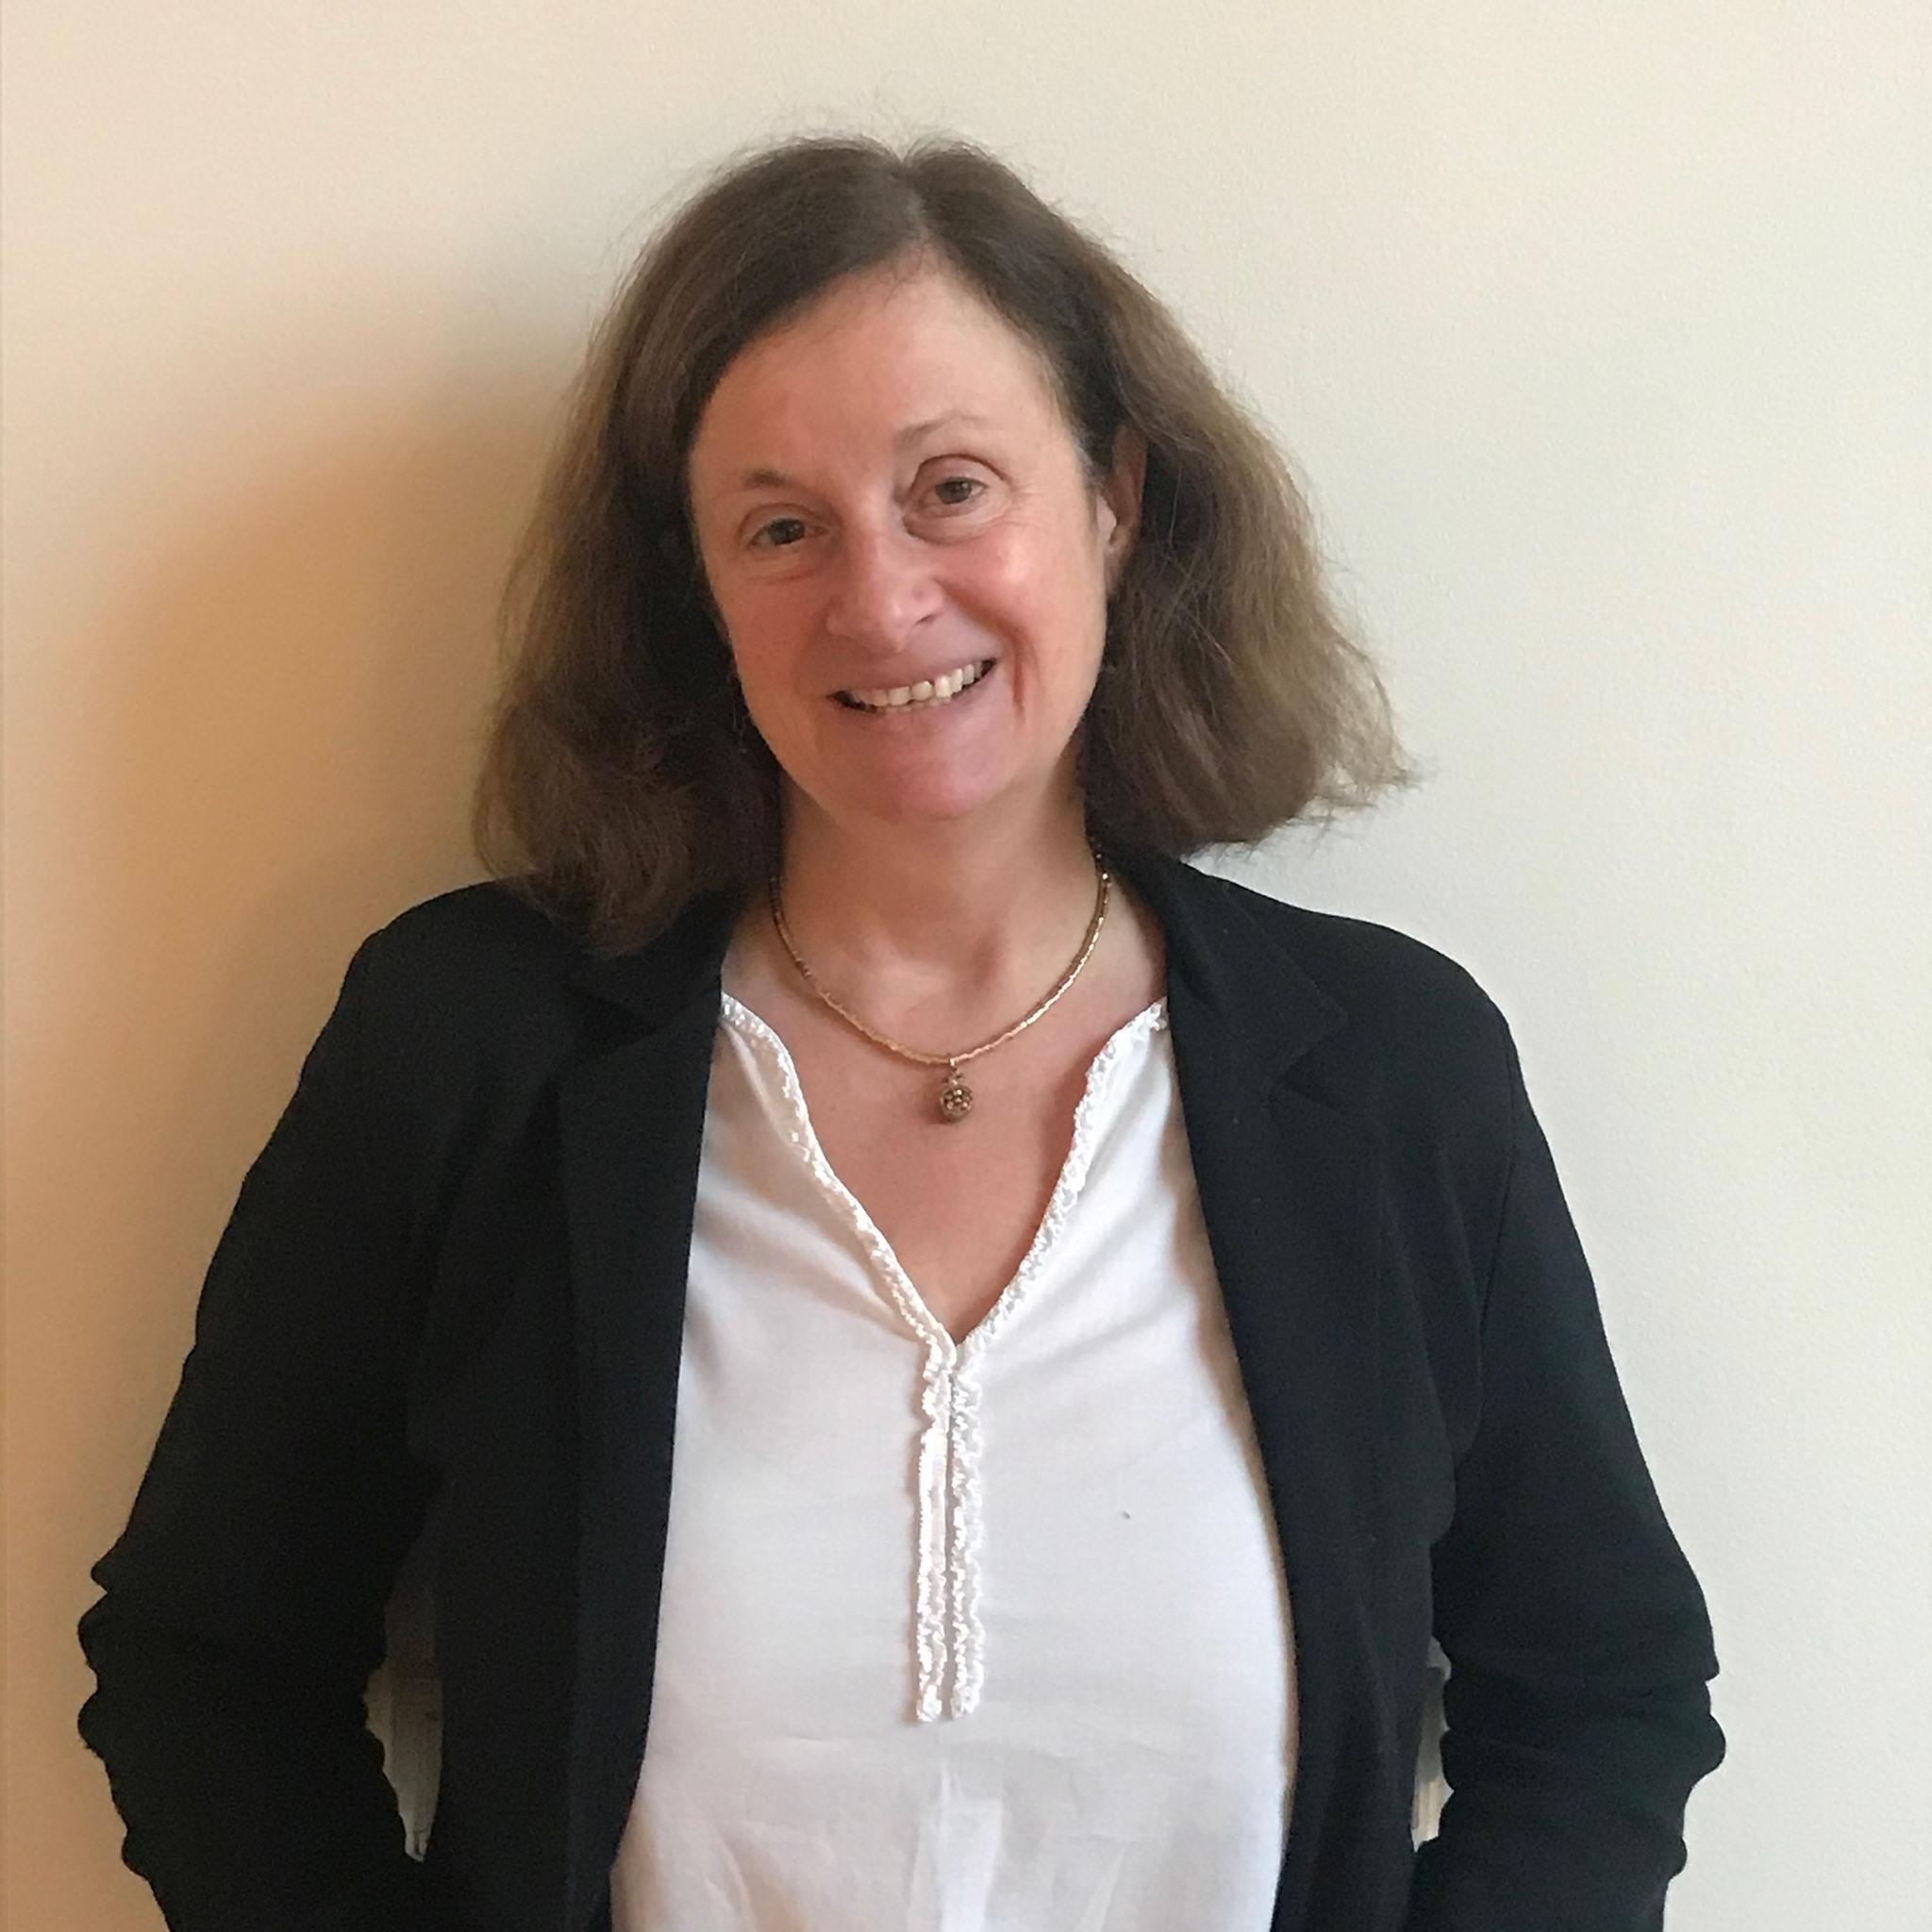 Barbara von Ow-Freytag